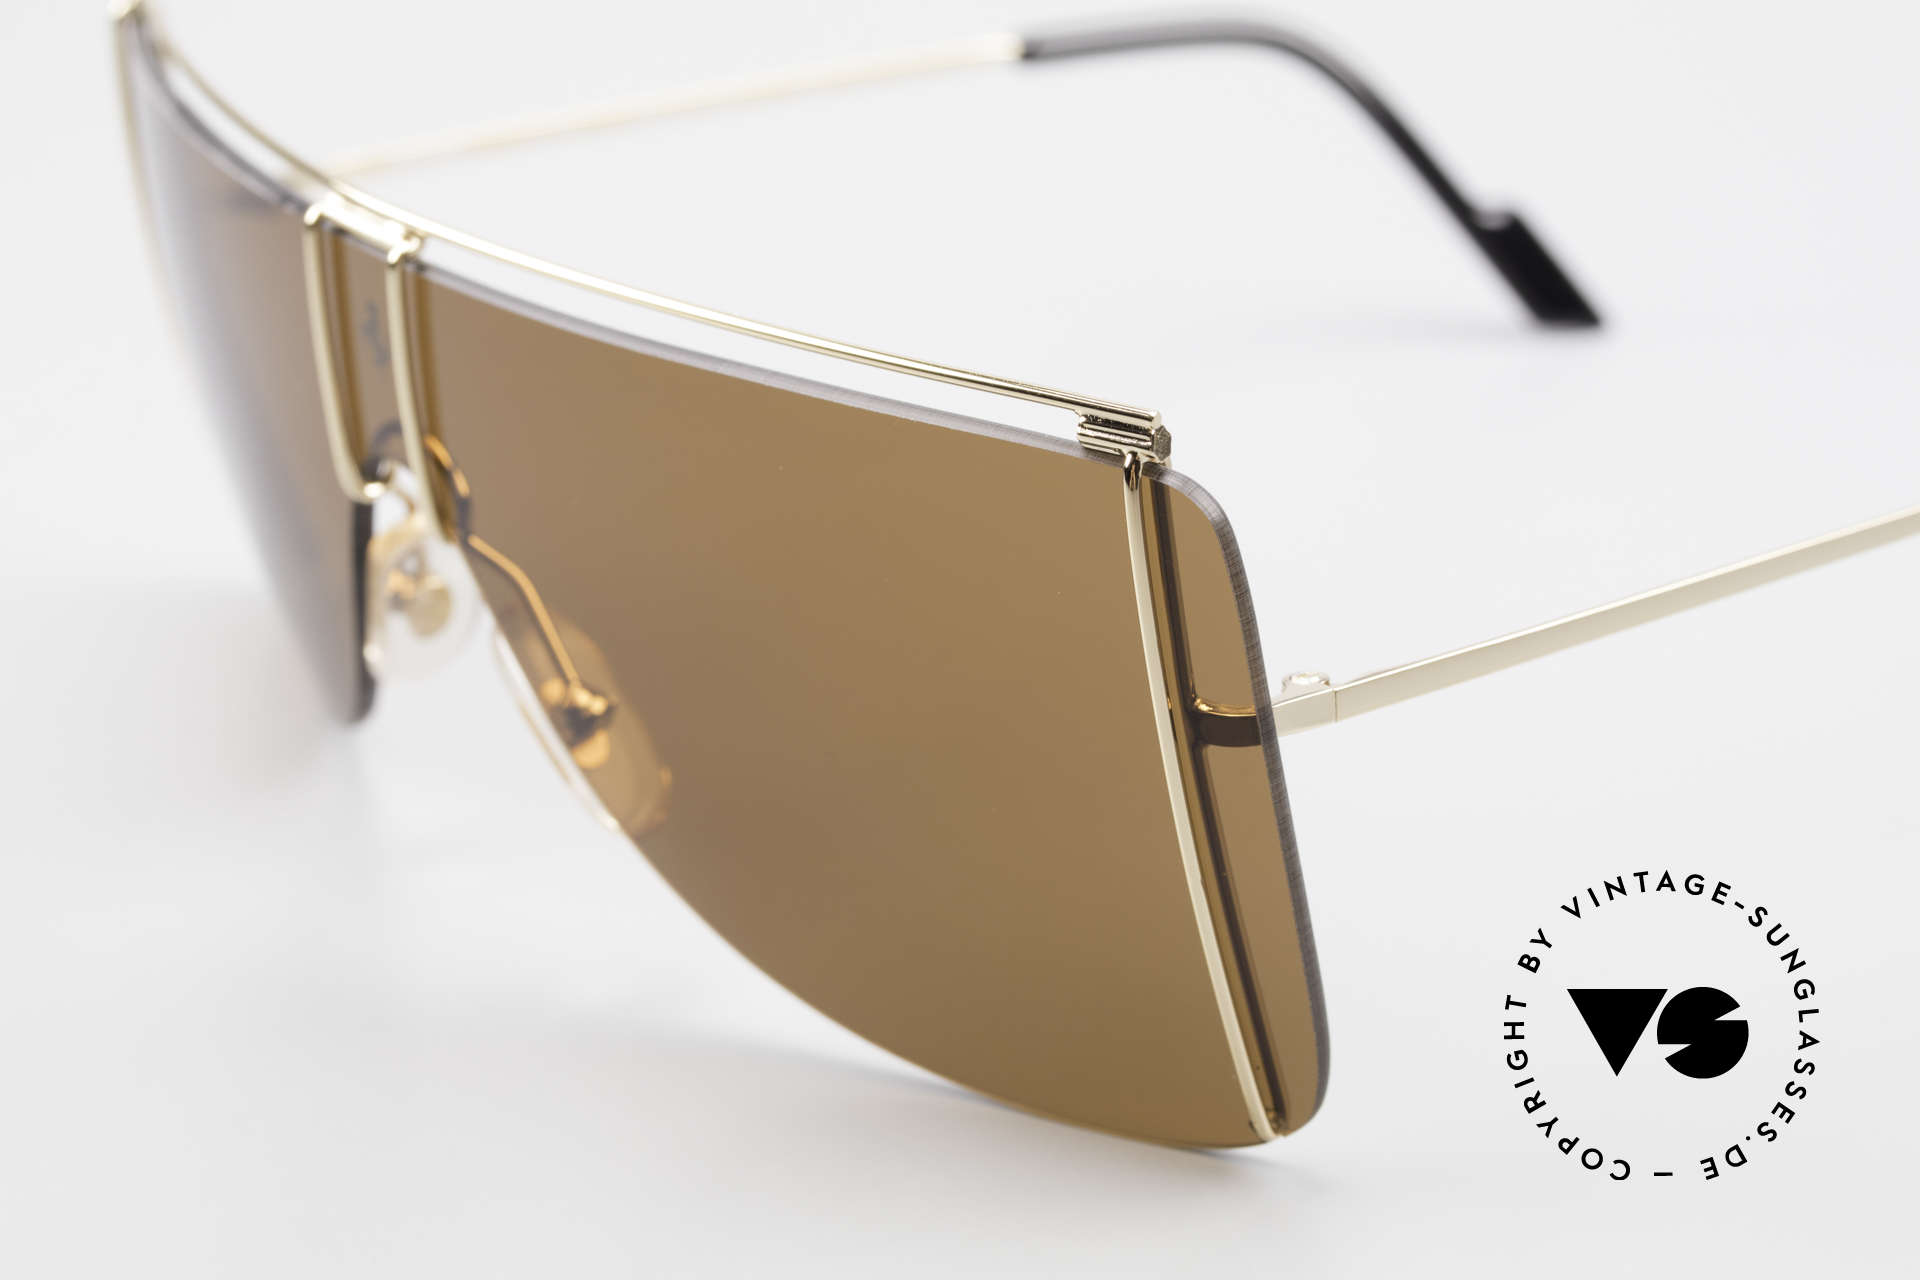 Ferrari F20/S Kylie Jenner Sunglasses, worn by Kylie Jenner (check Instagram or Google), Made for Men and Women